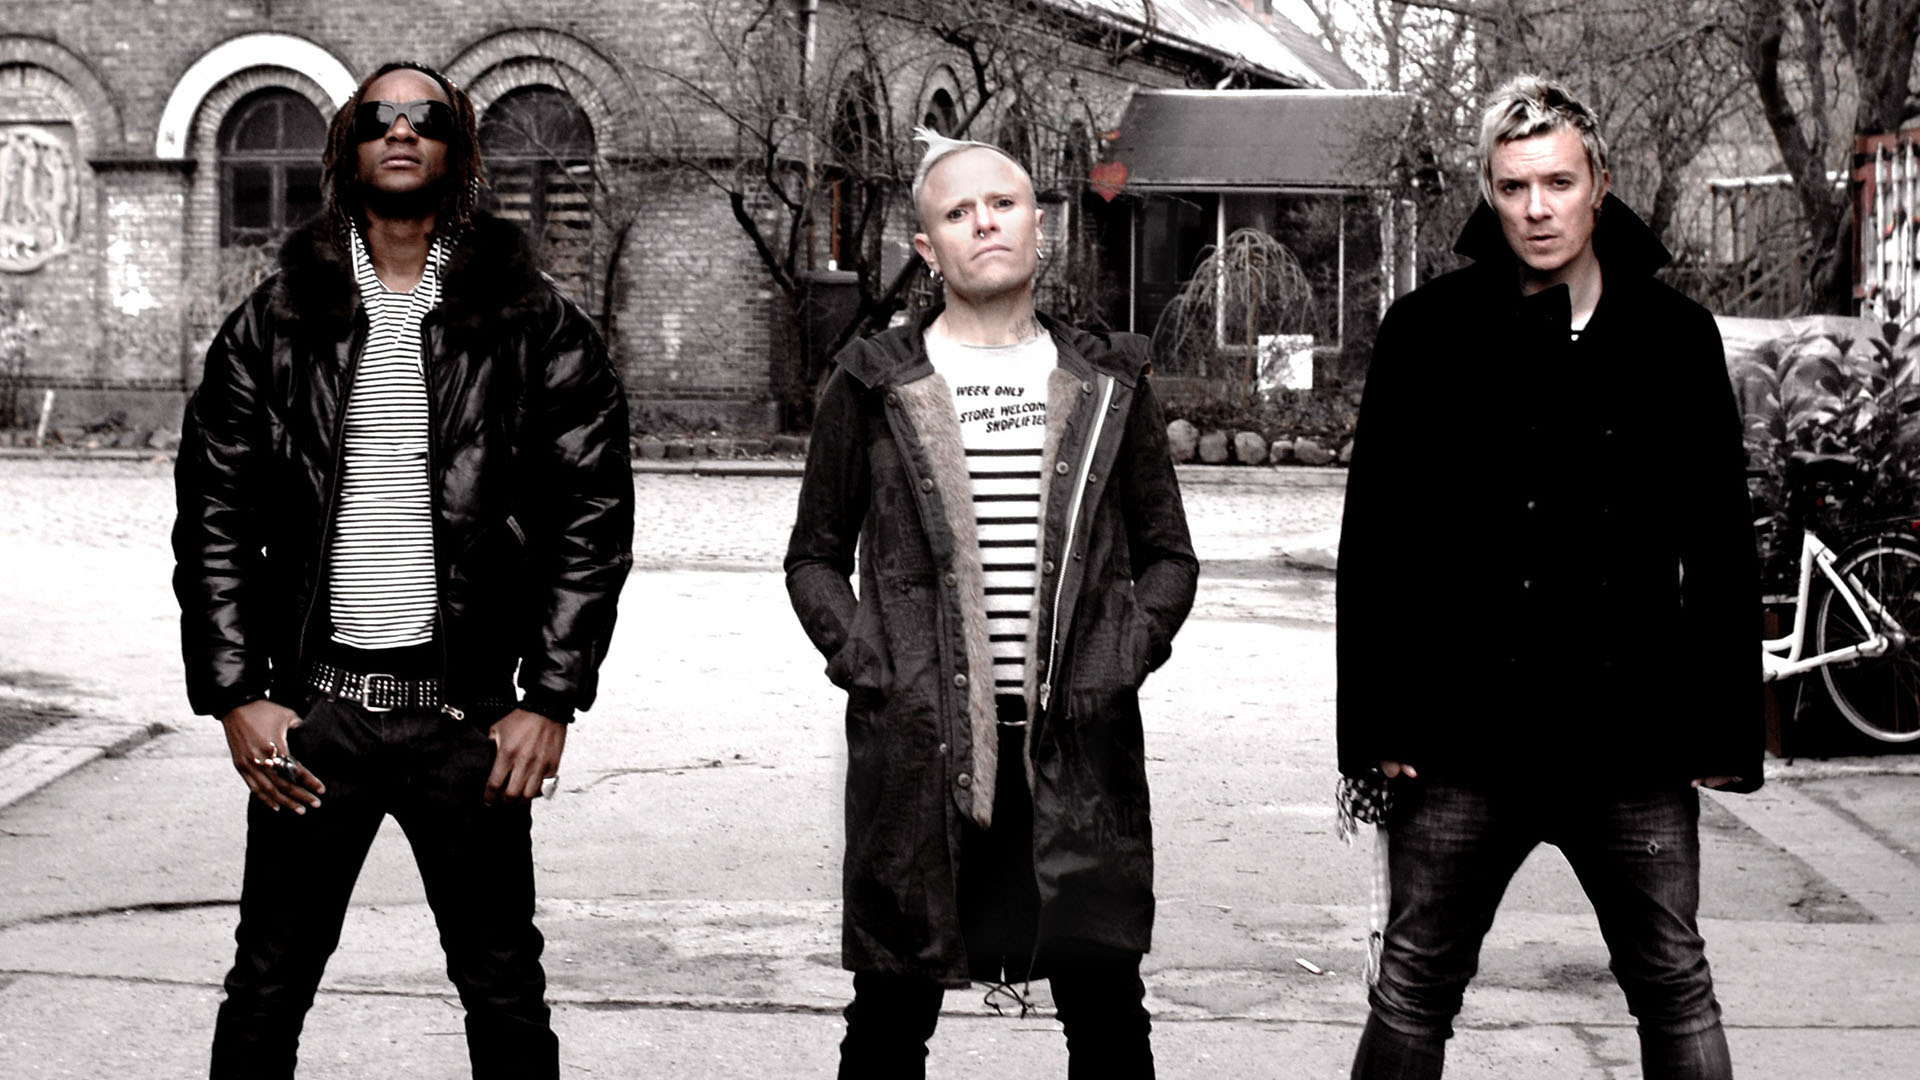 The Prodigy - Diesel Power & Instrumental Version [Punk Breaks]